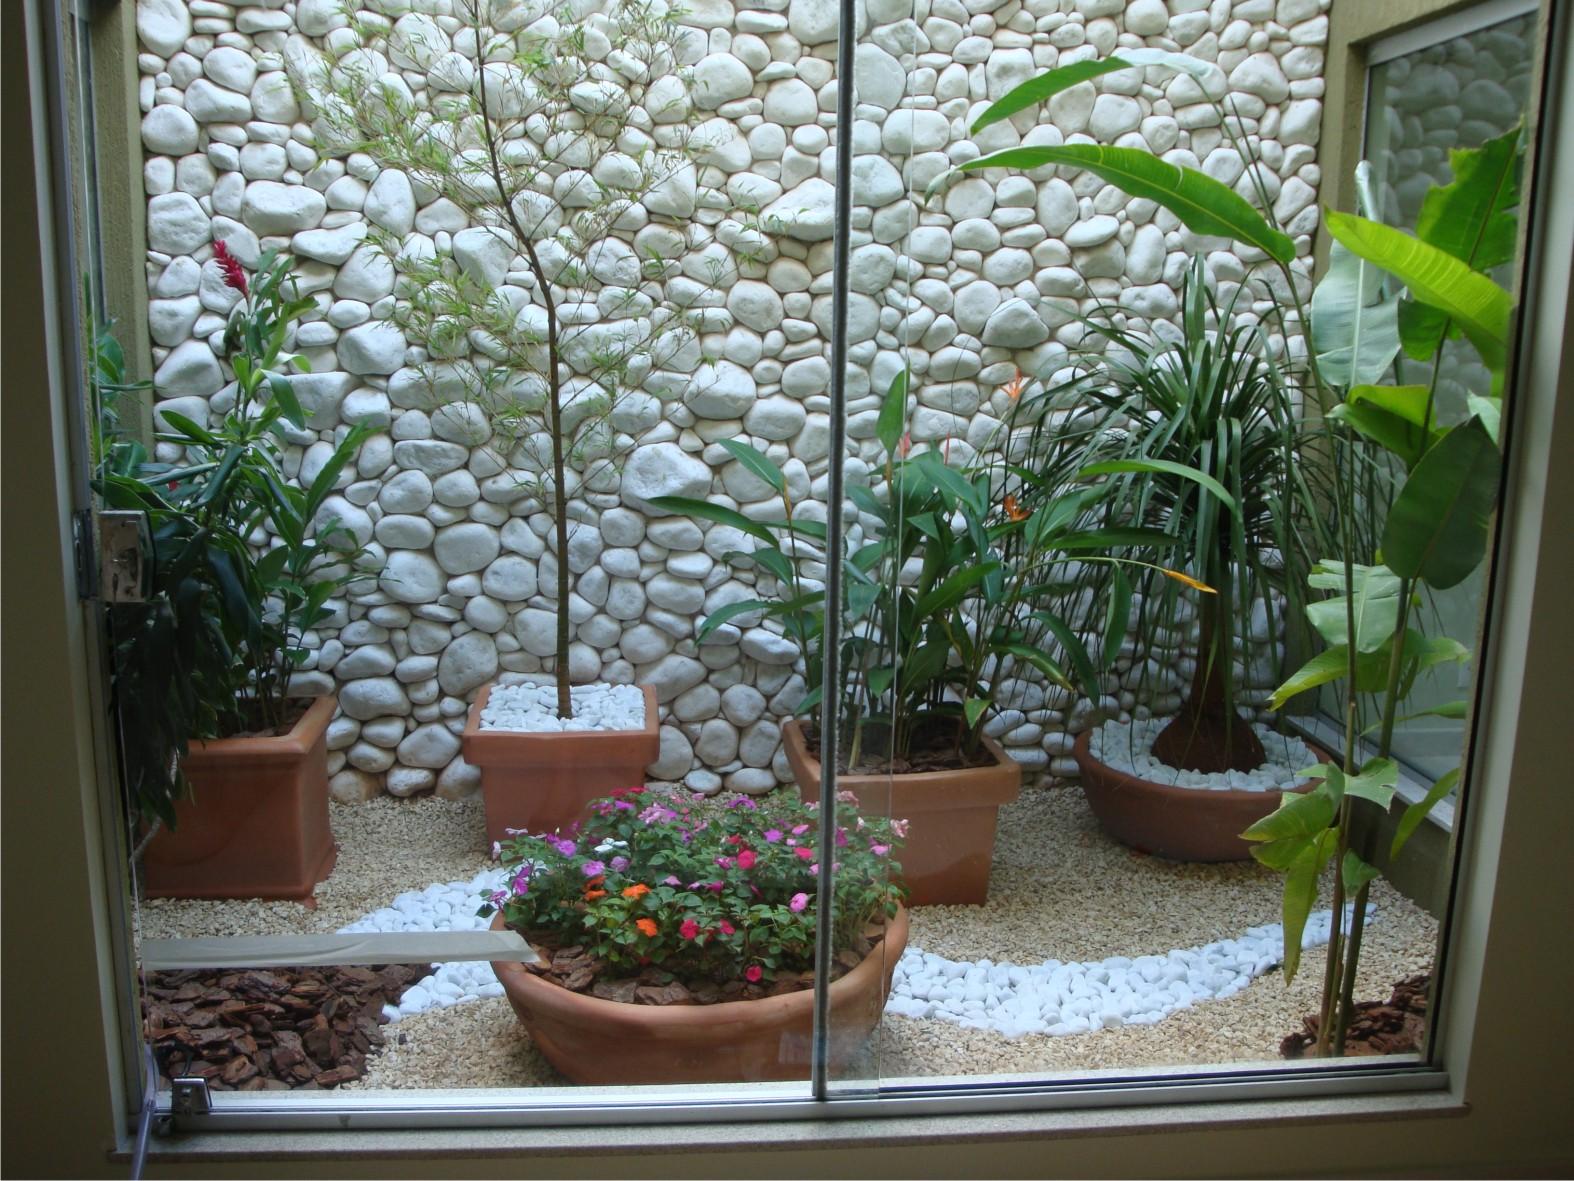 pedras jardim de inverno ? Doitri.com